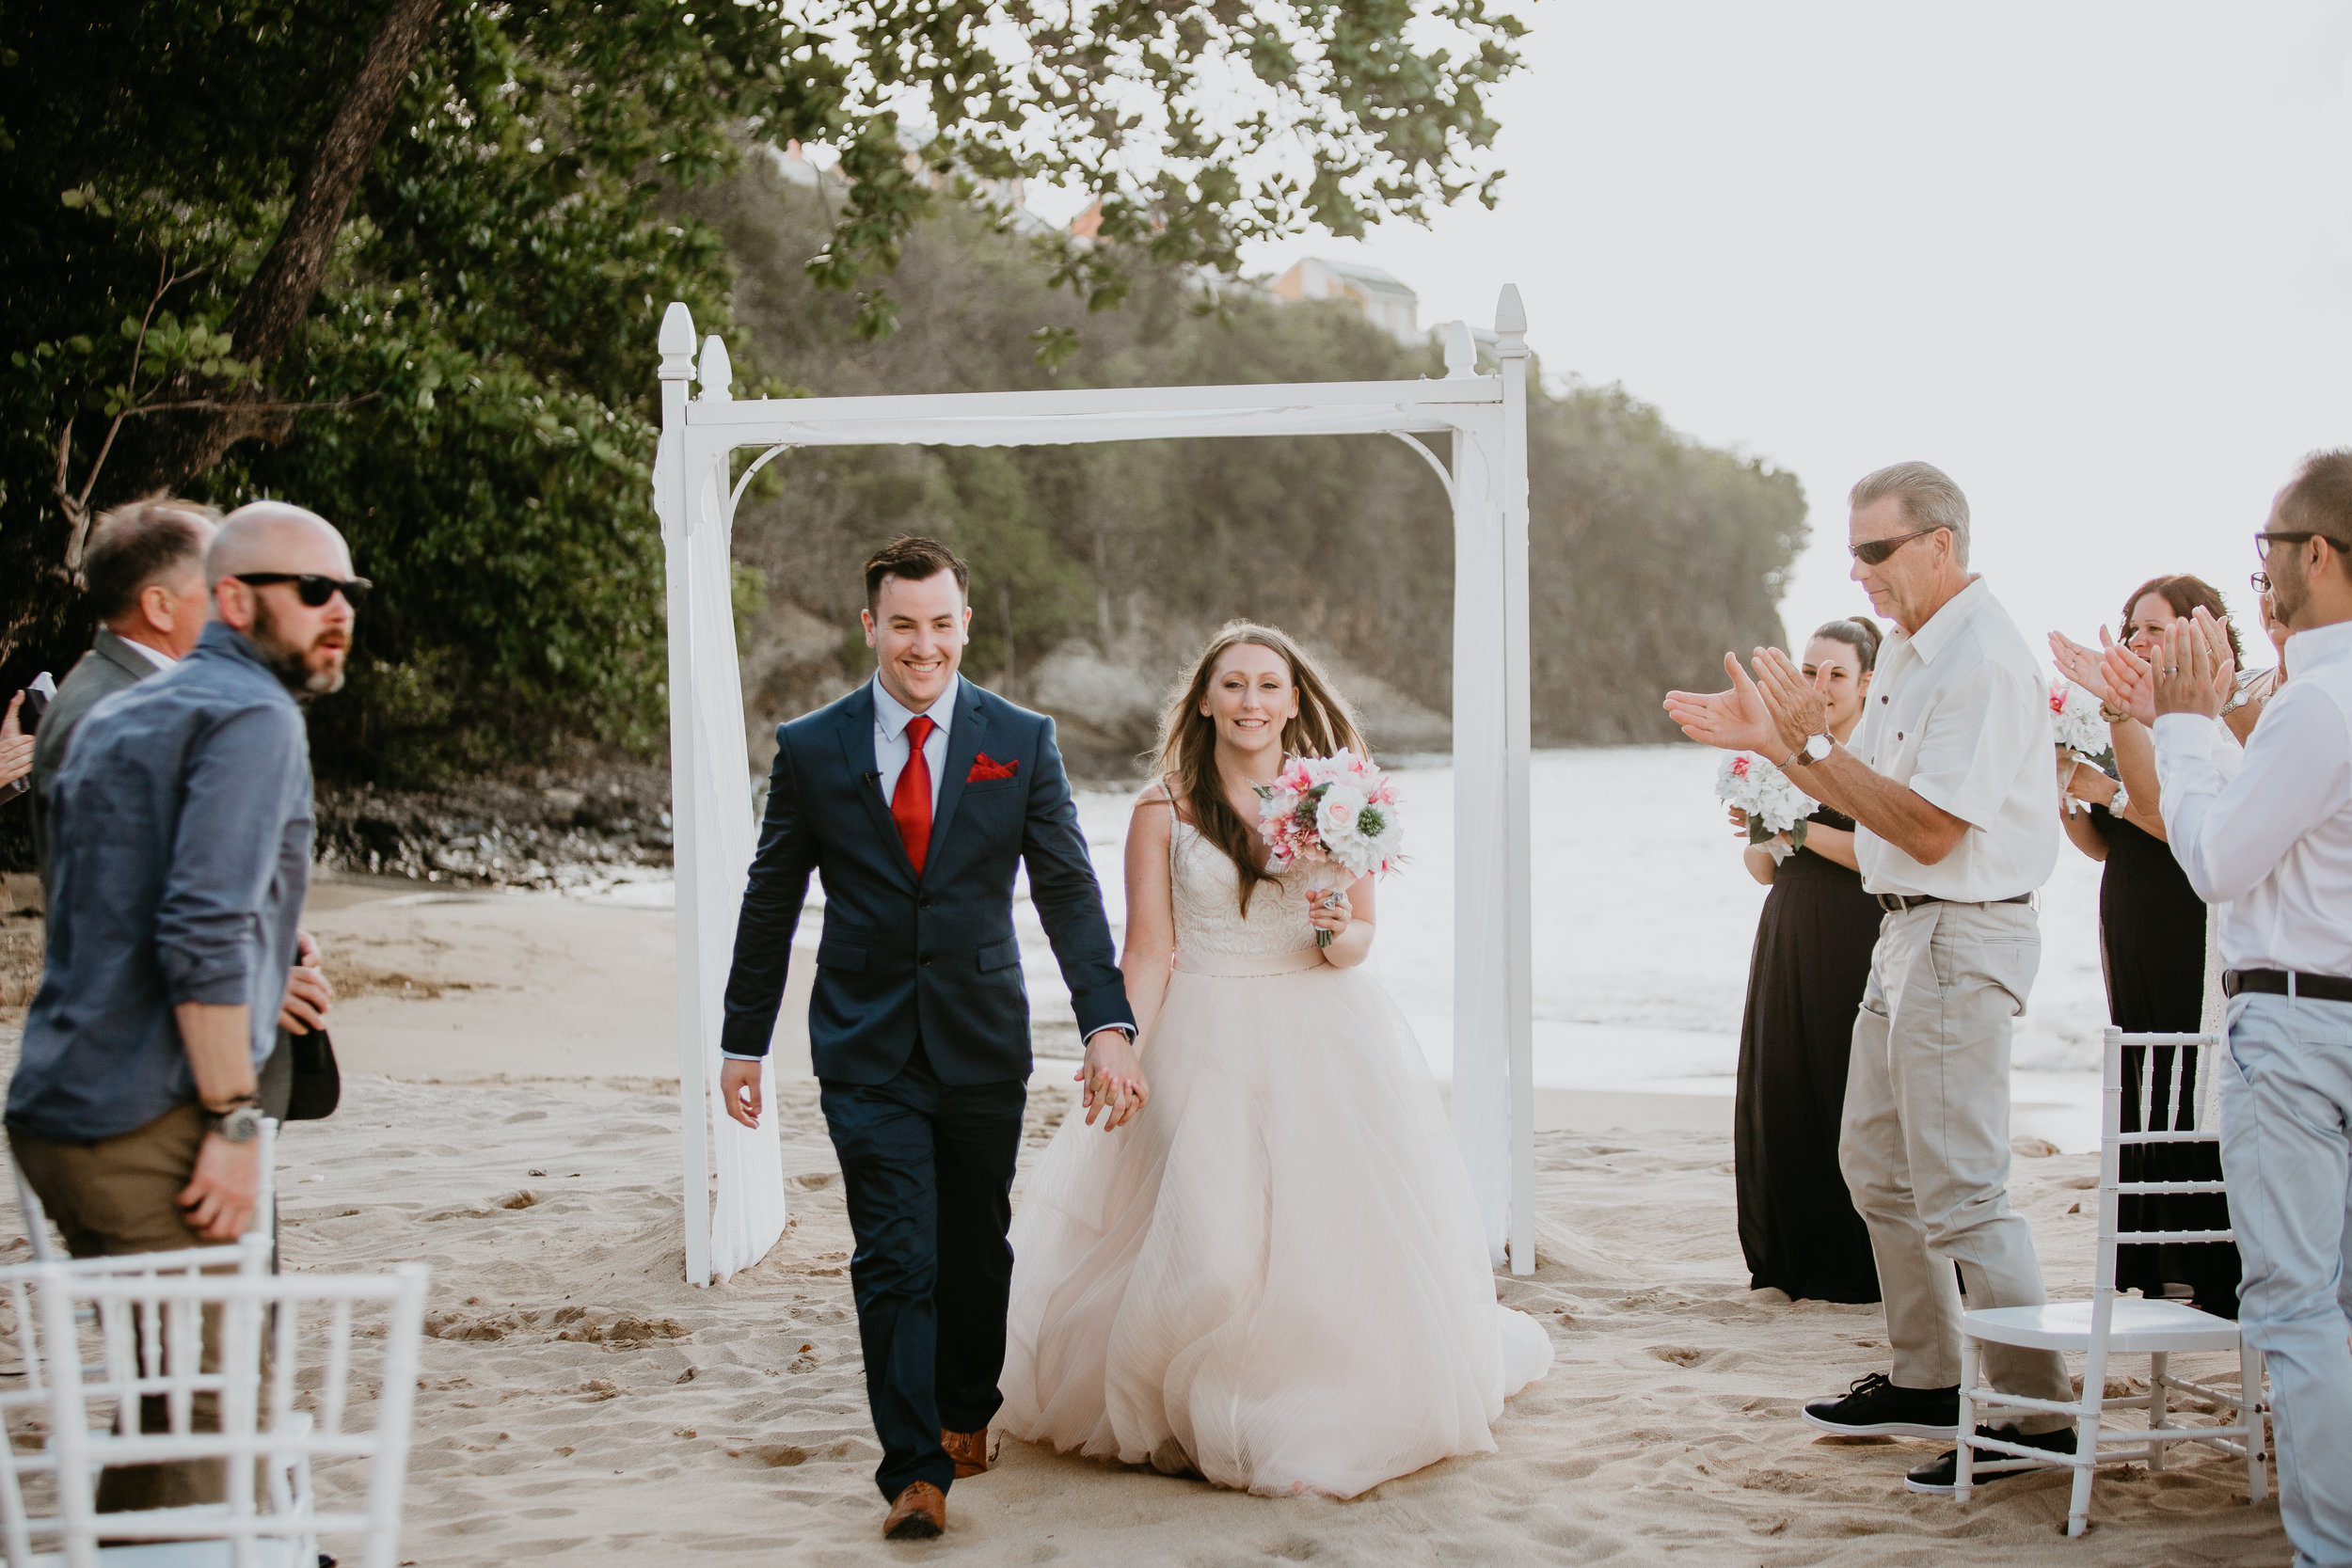 nicole-daacke-photography-destination-wedding-in-st-lucia-sandals-la-toc-intimate-island-wedding-carribean-elopement-photographer-chill-island-wedding-74.jpg